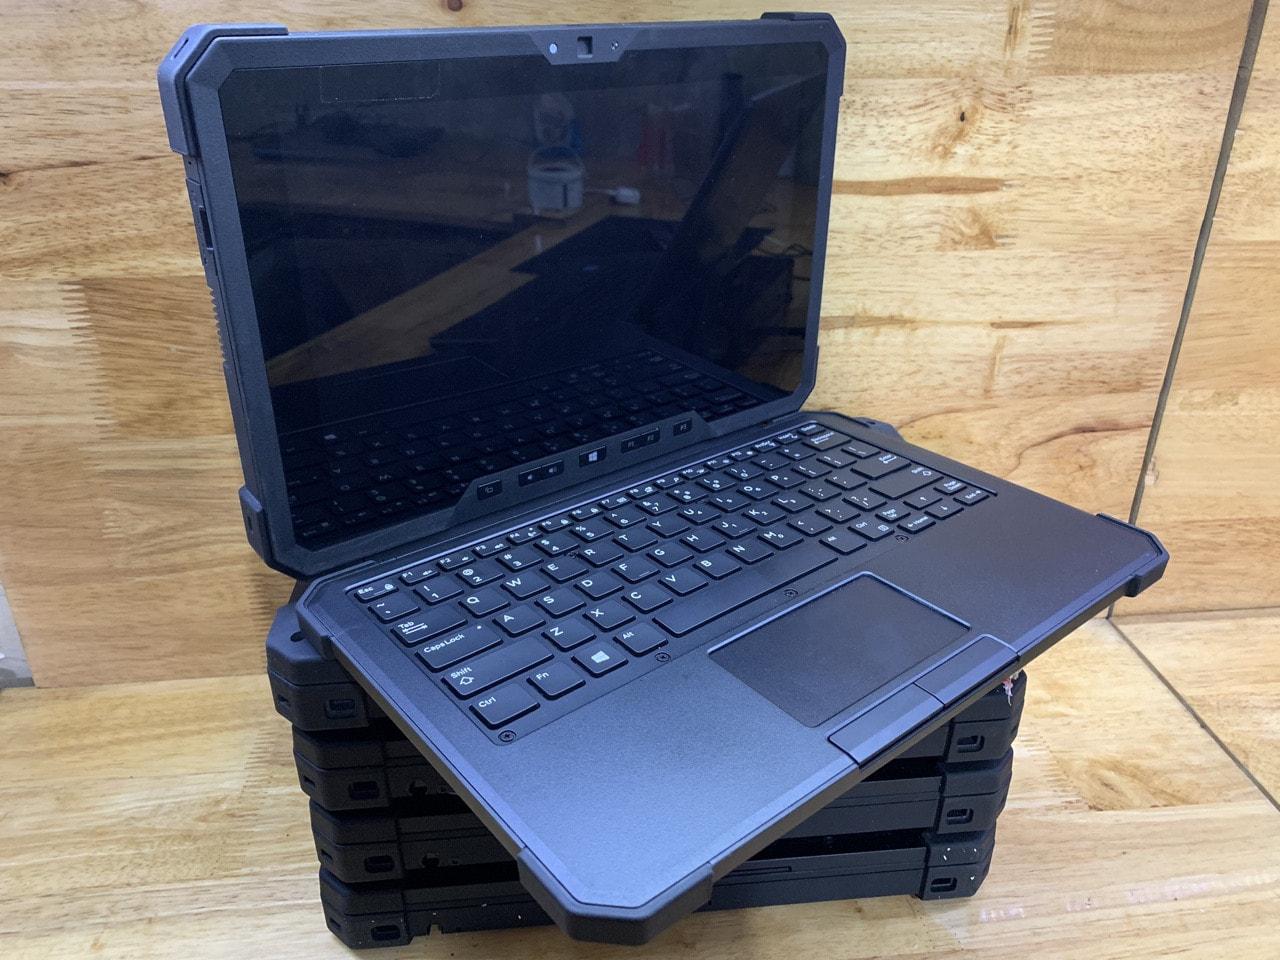 "Dell Latitude 7202 RUGGED TABLET Core™ M-5Y71 8GB SSD 128GB 11.6"" HD Touchscreen Windows 10 Core™ M-5Y10C 800MHz 128GB SSD 4GB"